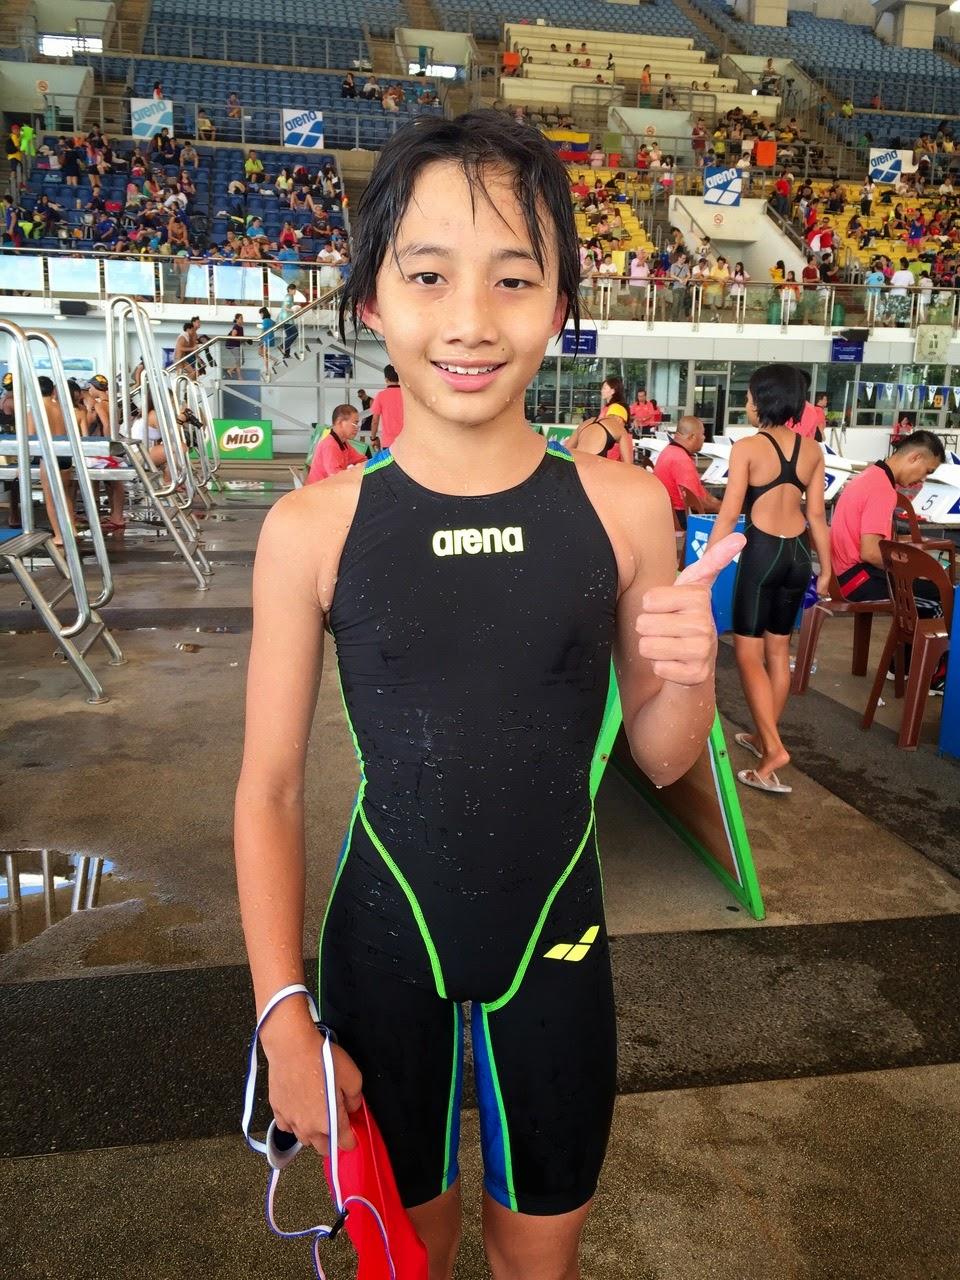 Ikan Bilis Swimming Club (1971) KL: Day 3 Results - 51st MAG 2015